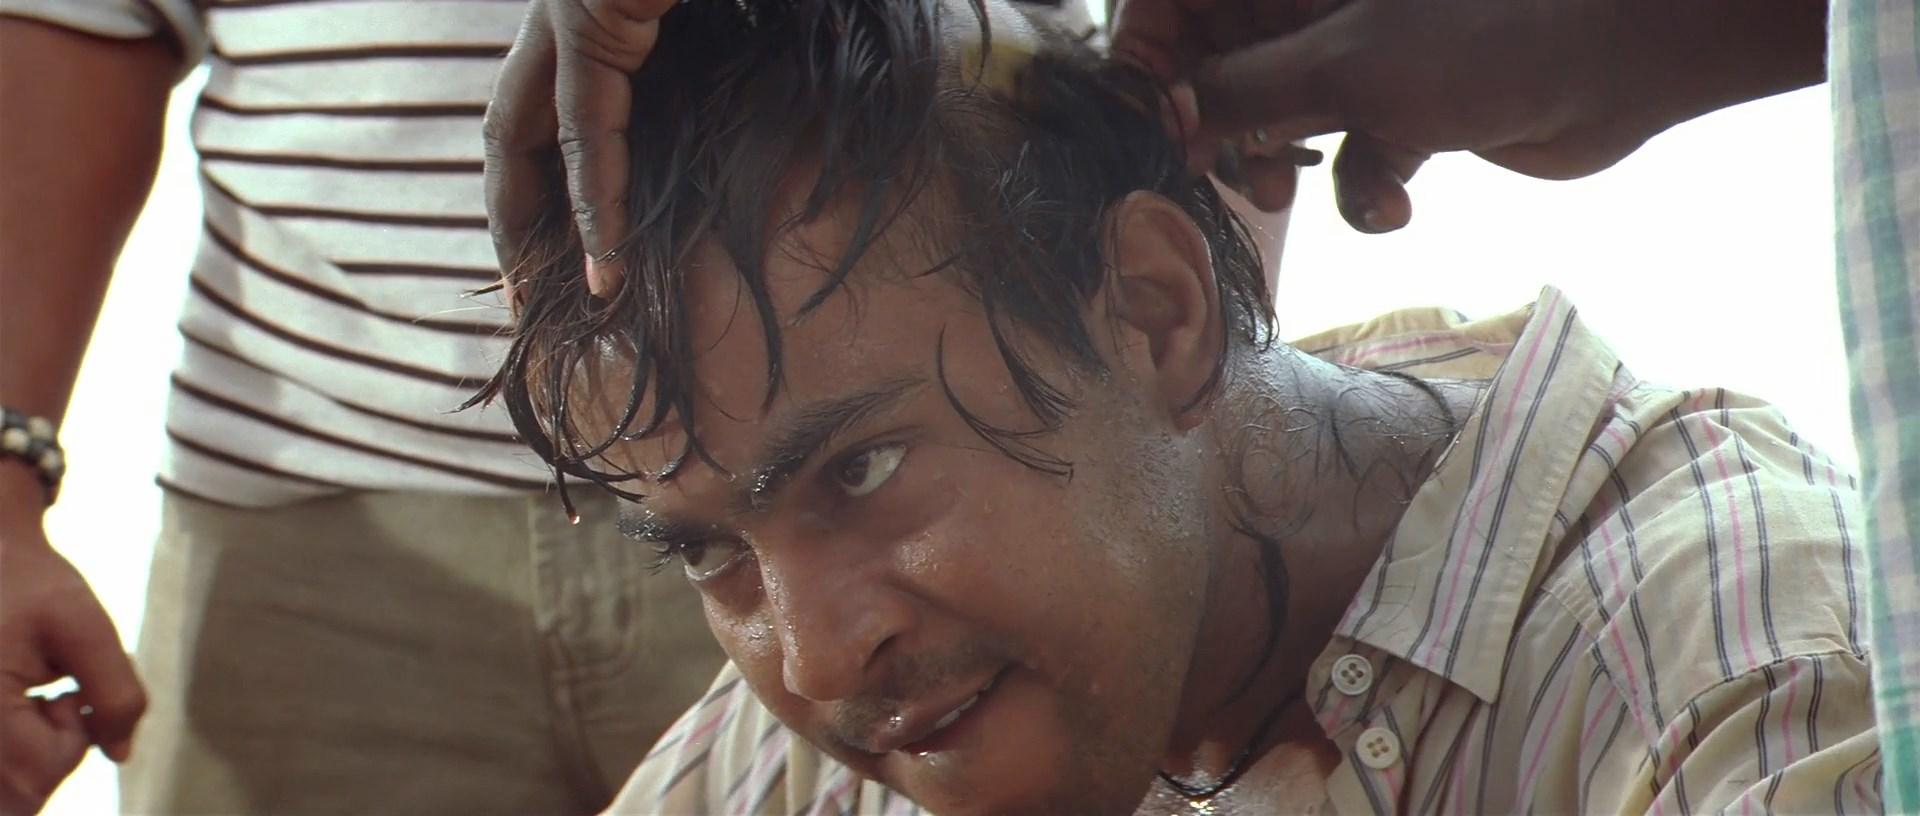 Refugee.2006.Bangali.1080p.WEB DL.H264.AAC.D0T.Telly.mkv snapshot 00.49.48.000